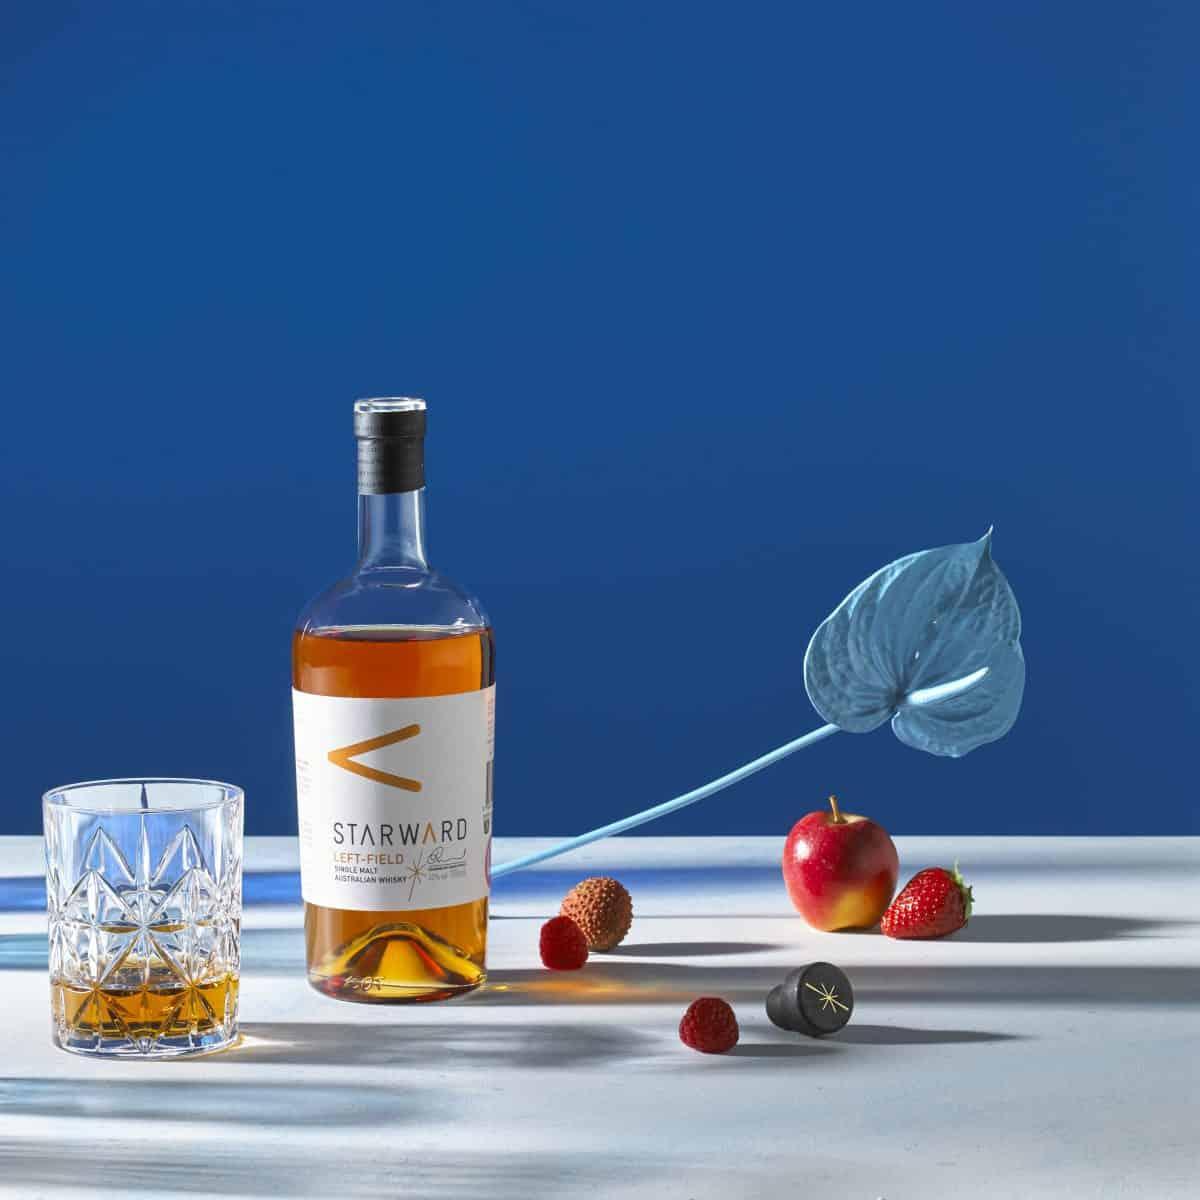 Starward Left-Field Single Malt Australian Whisky